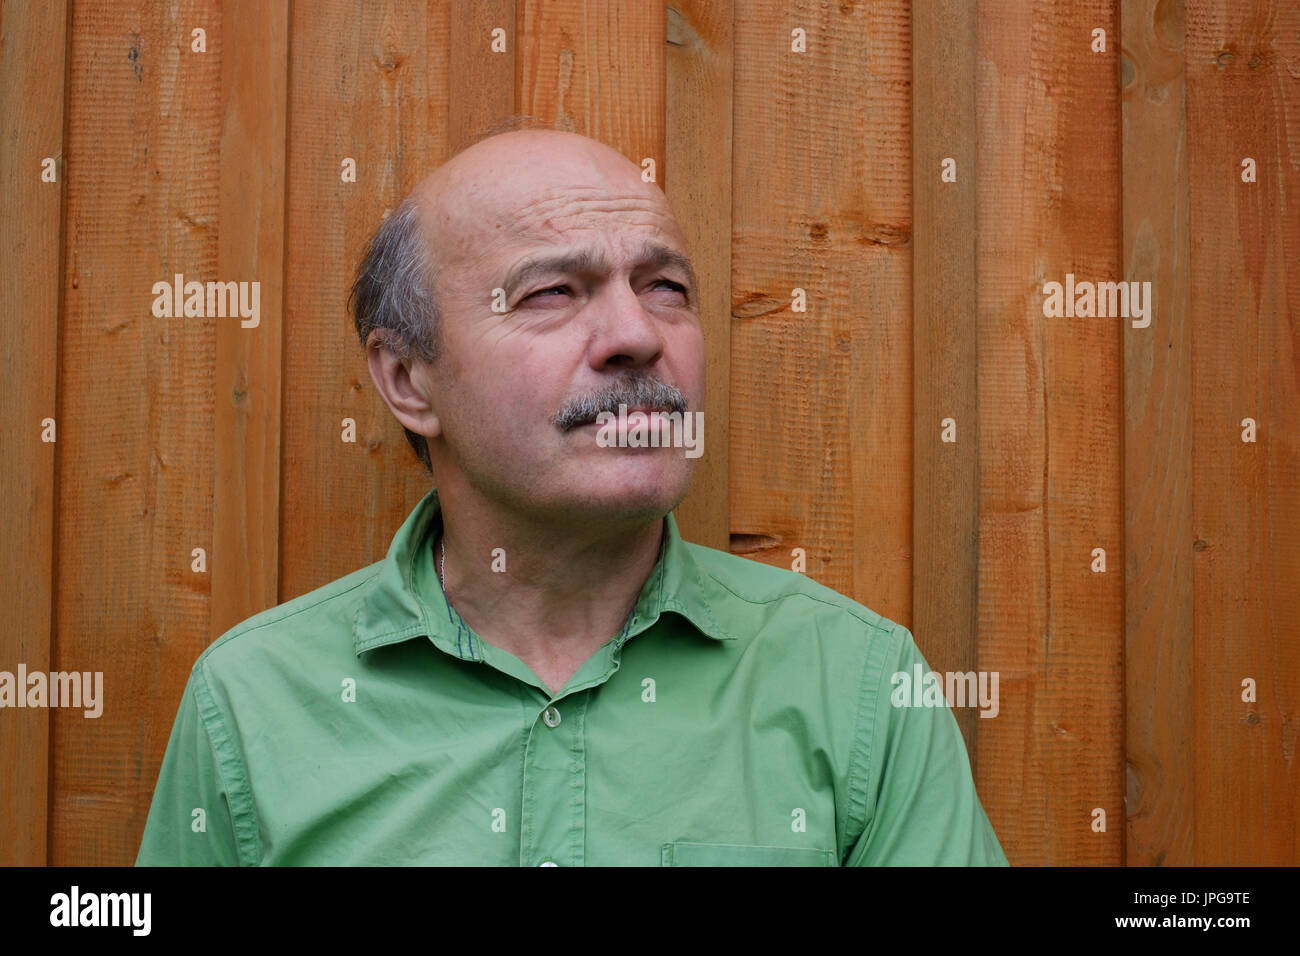 Caucassian man grimacing, portrait. - Stock Image